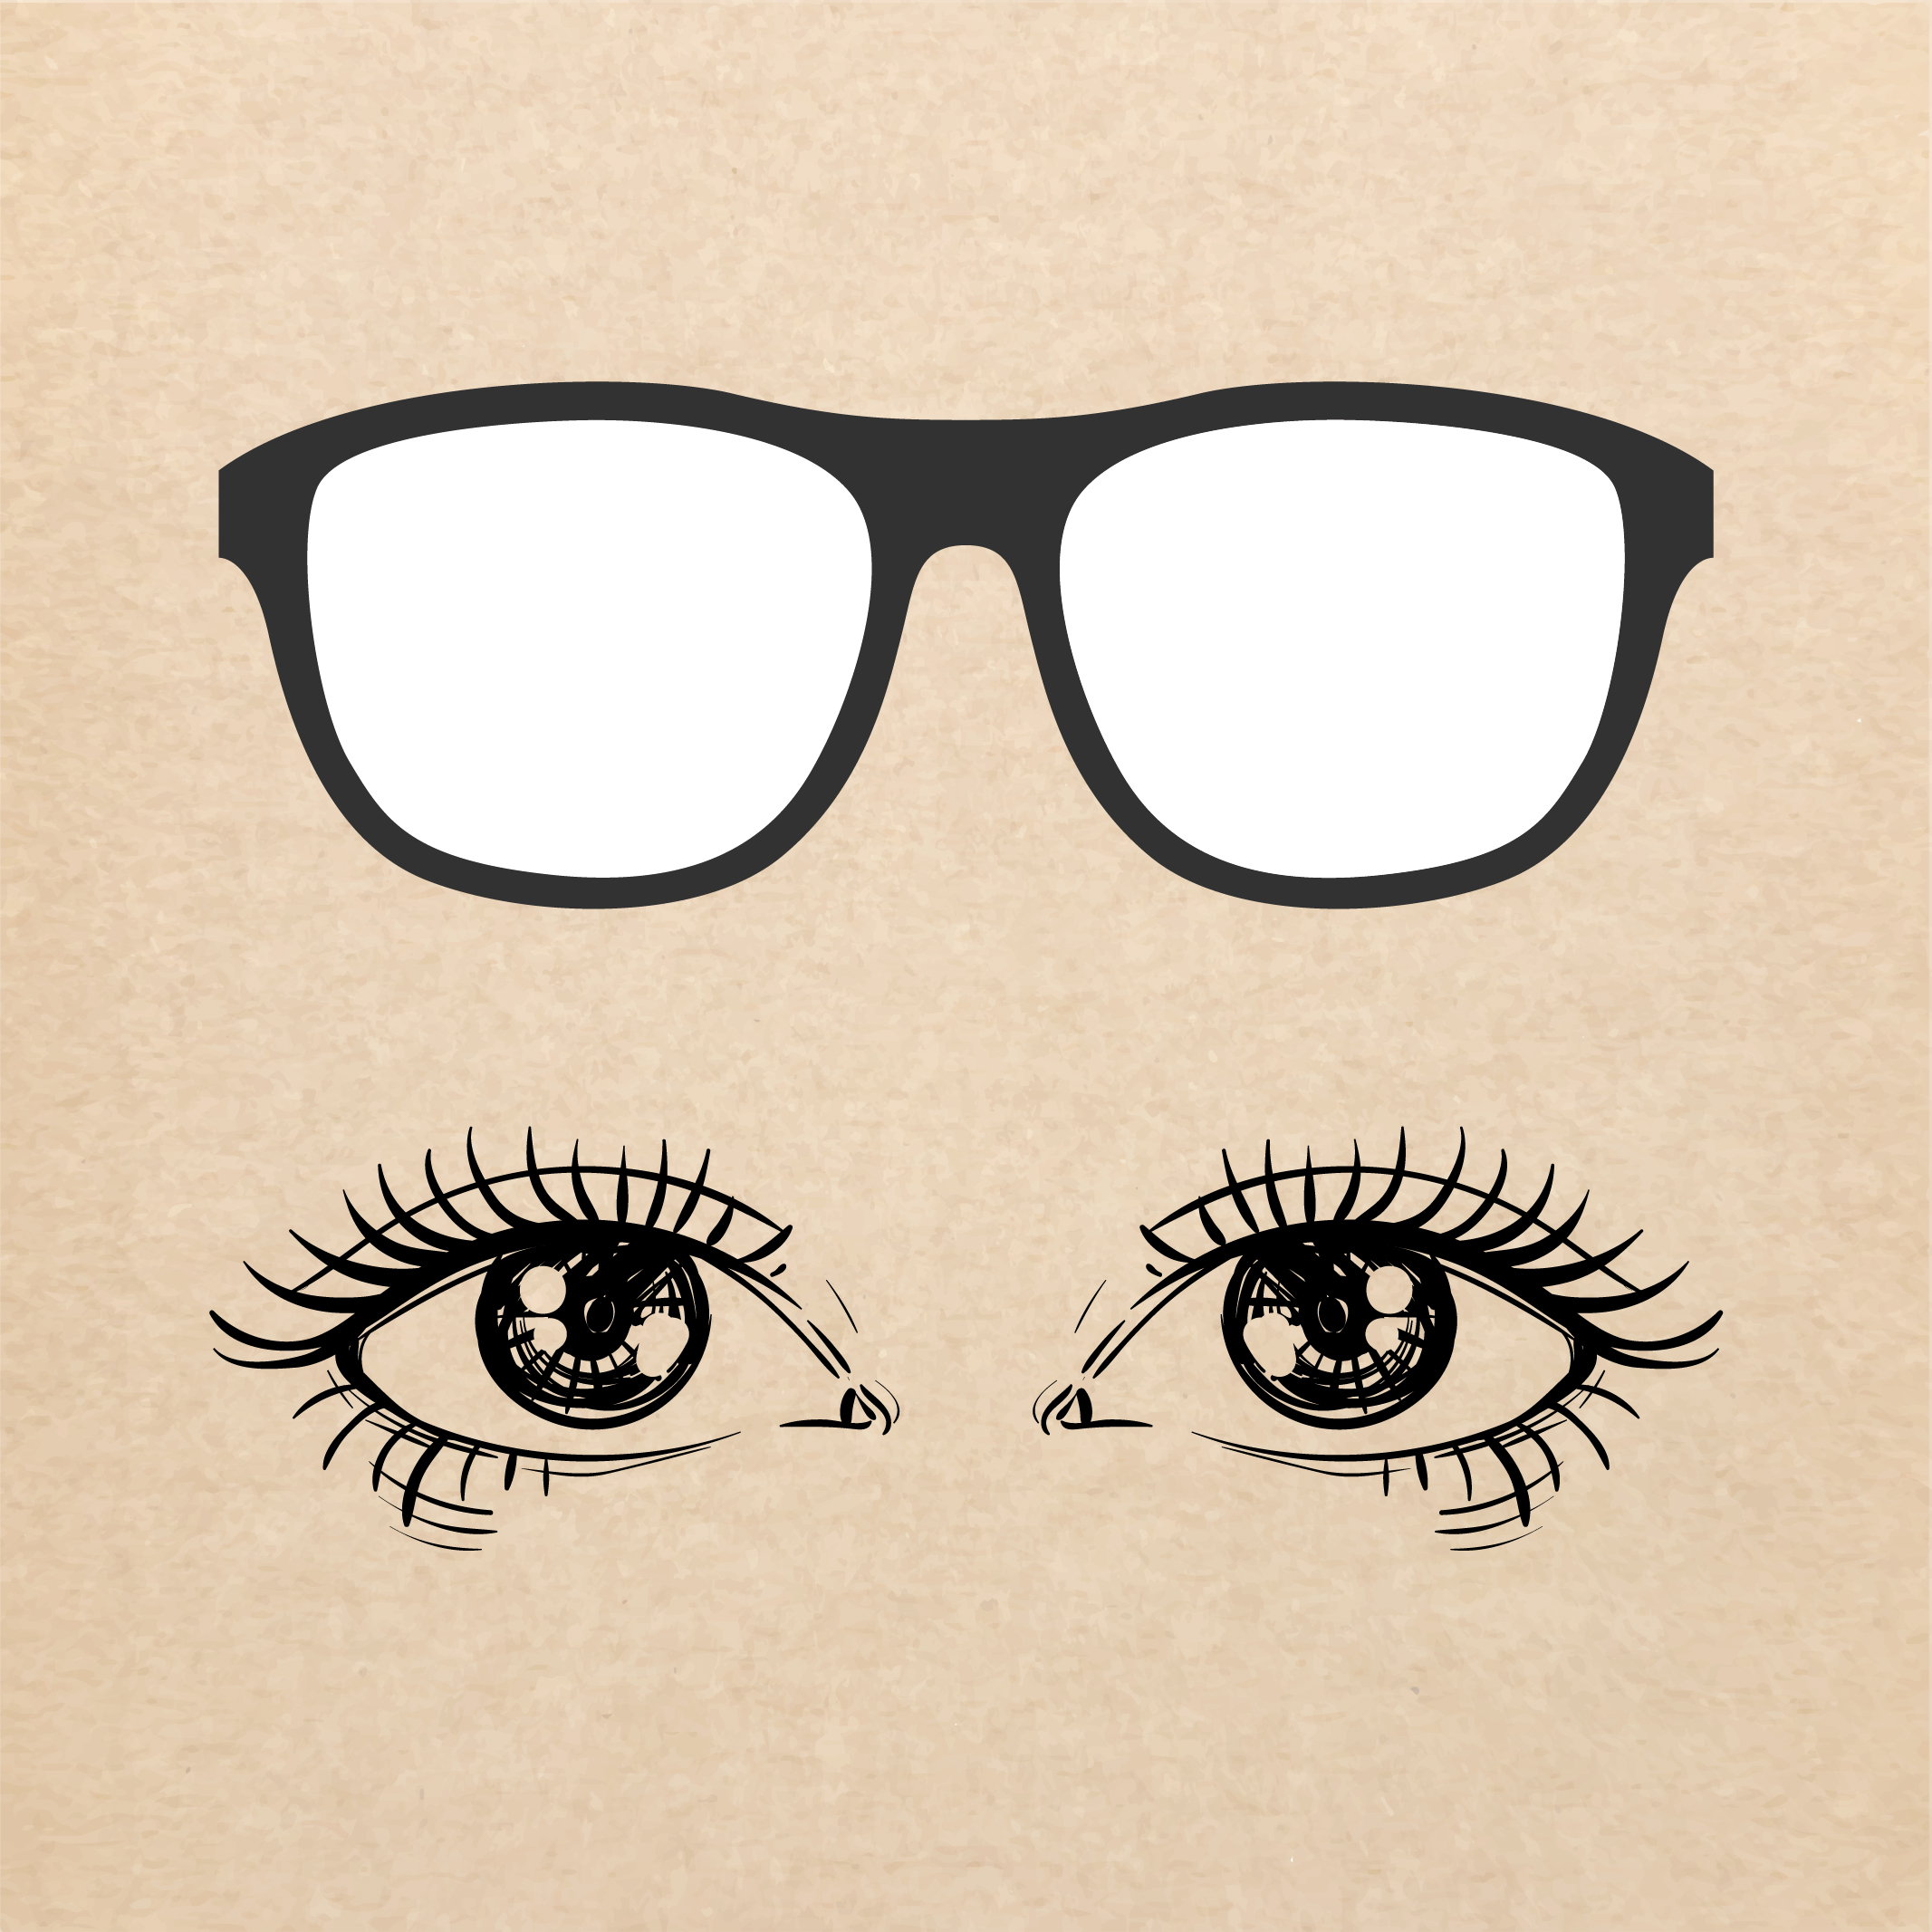 Effects Of Not Wearing Eyeglasses